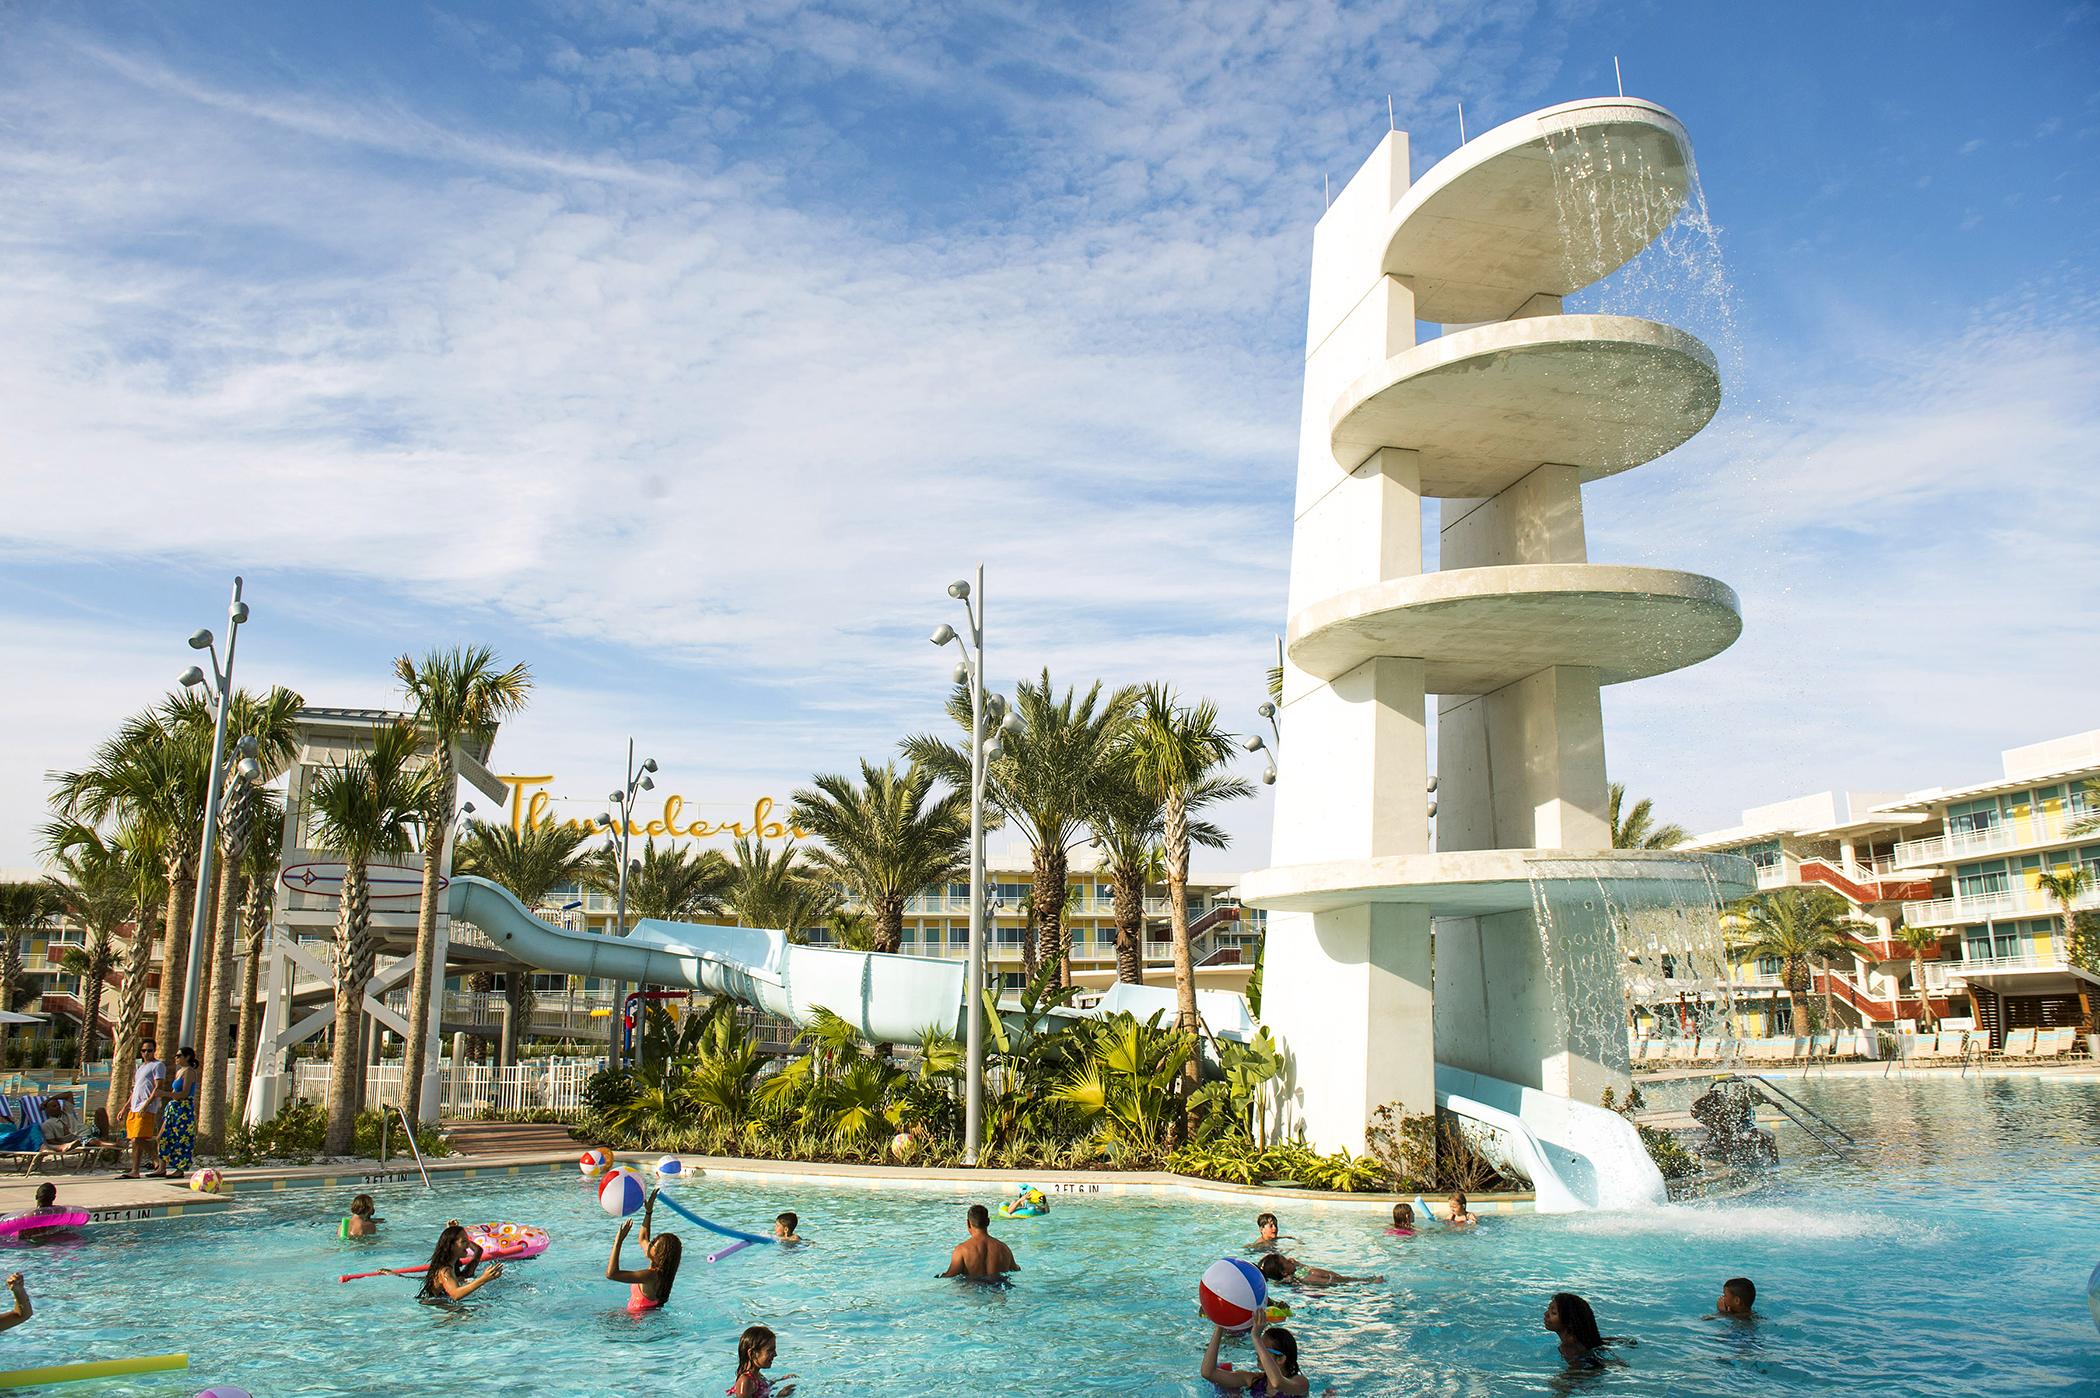 Universal Orlando's fourth on-site hotel, Universal's Cabana Bay Beach Resort